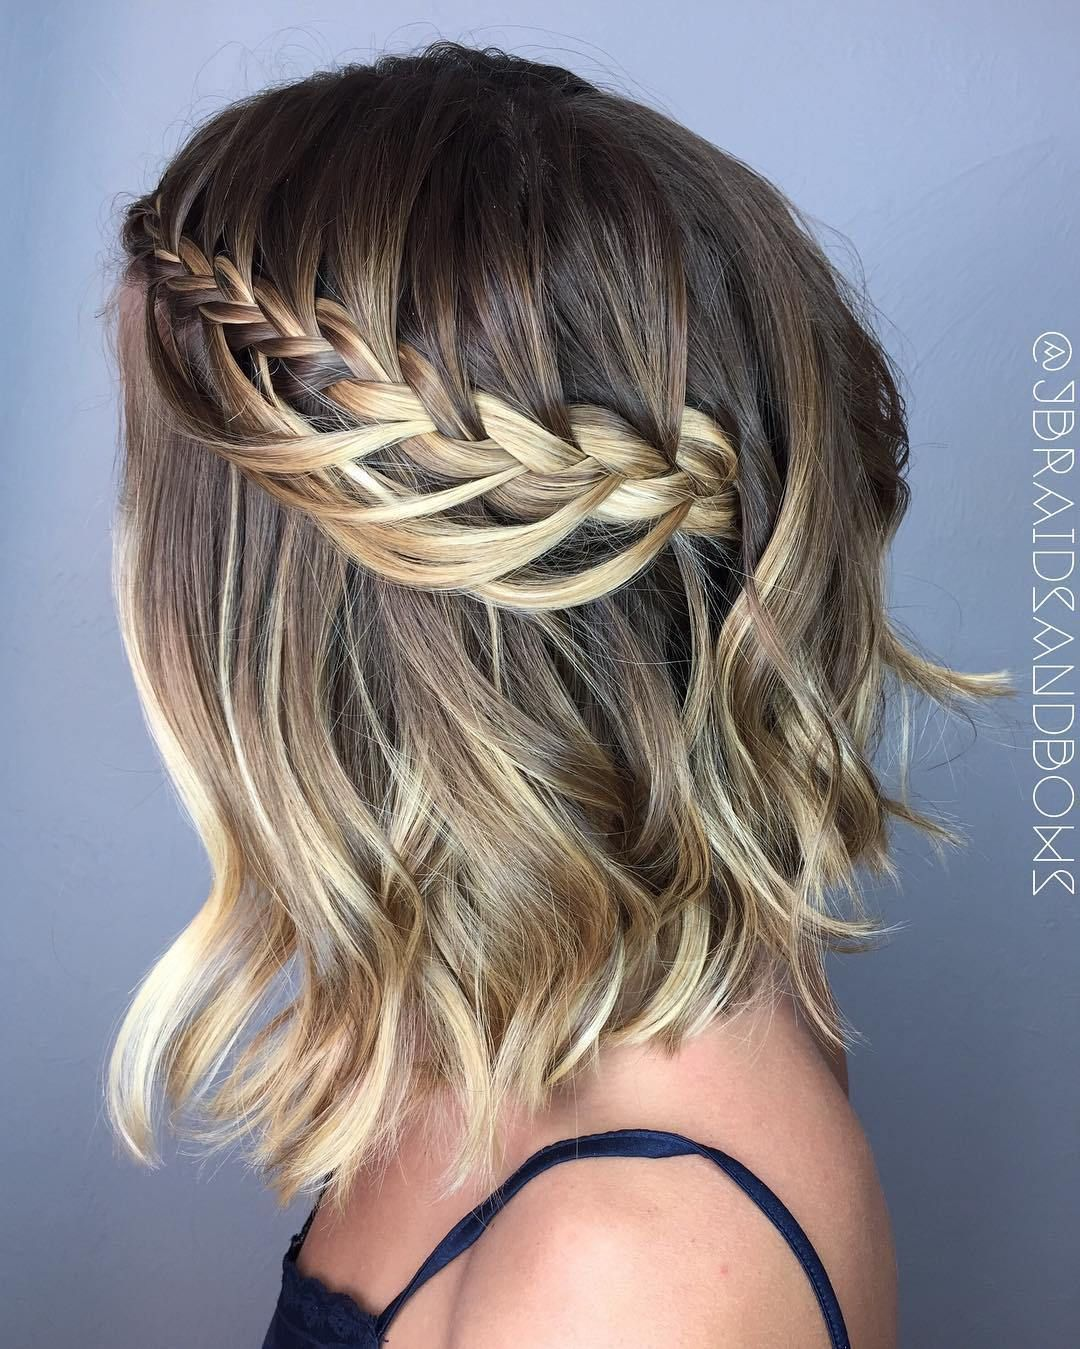 70 Perfect Medium Length Hairstyles For Thin Hair Prom Hairstyles For Short Hair Medium Length Hair Styles Hair Styles